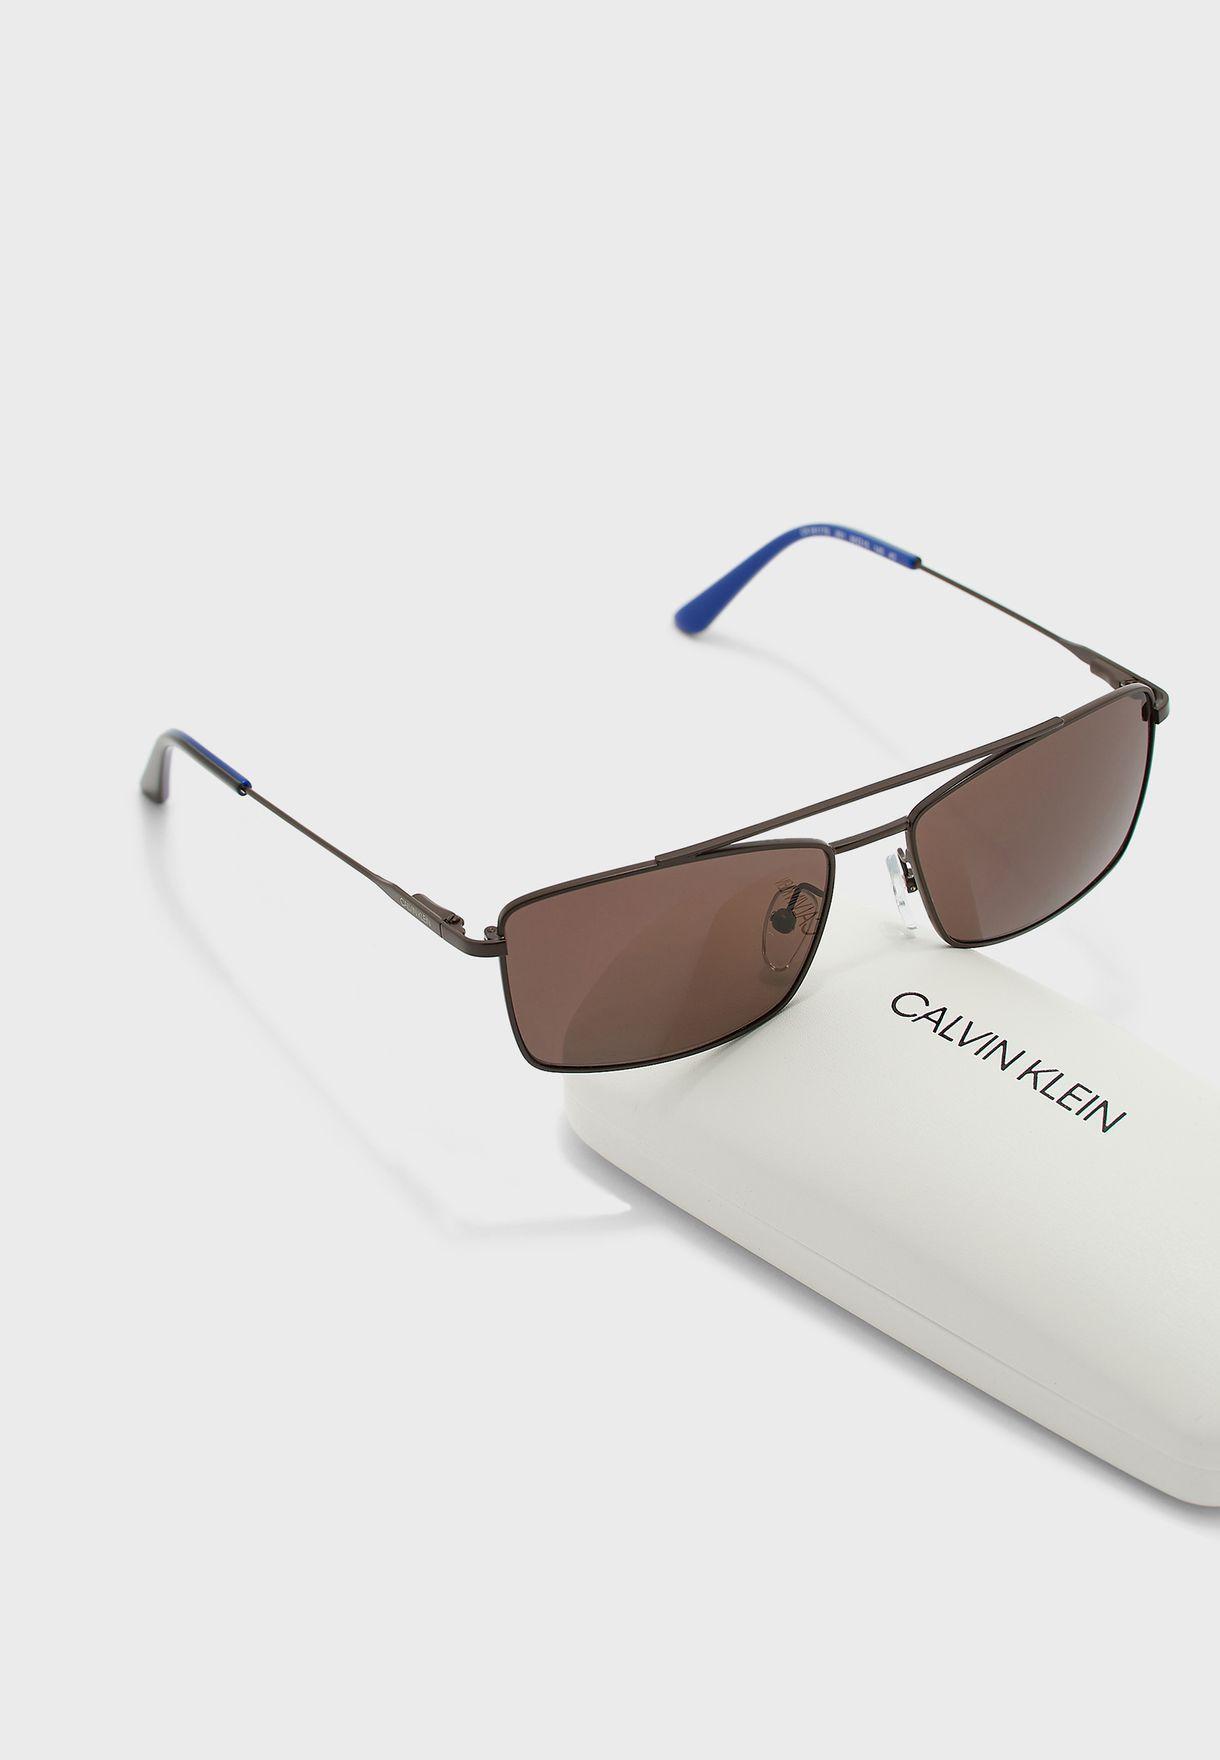 Ck18117S Square Sunglasses